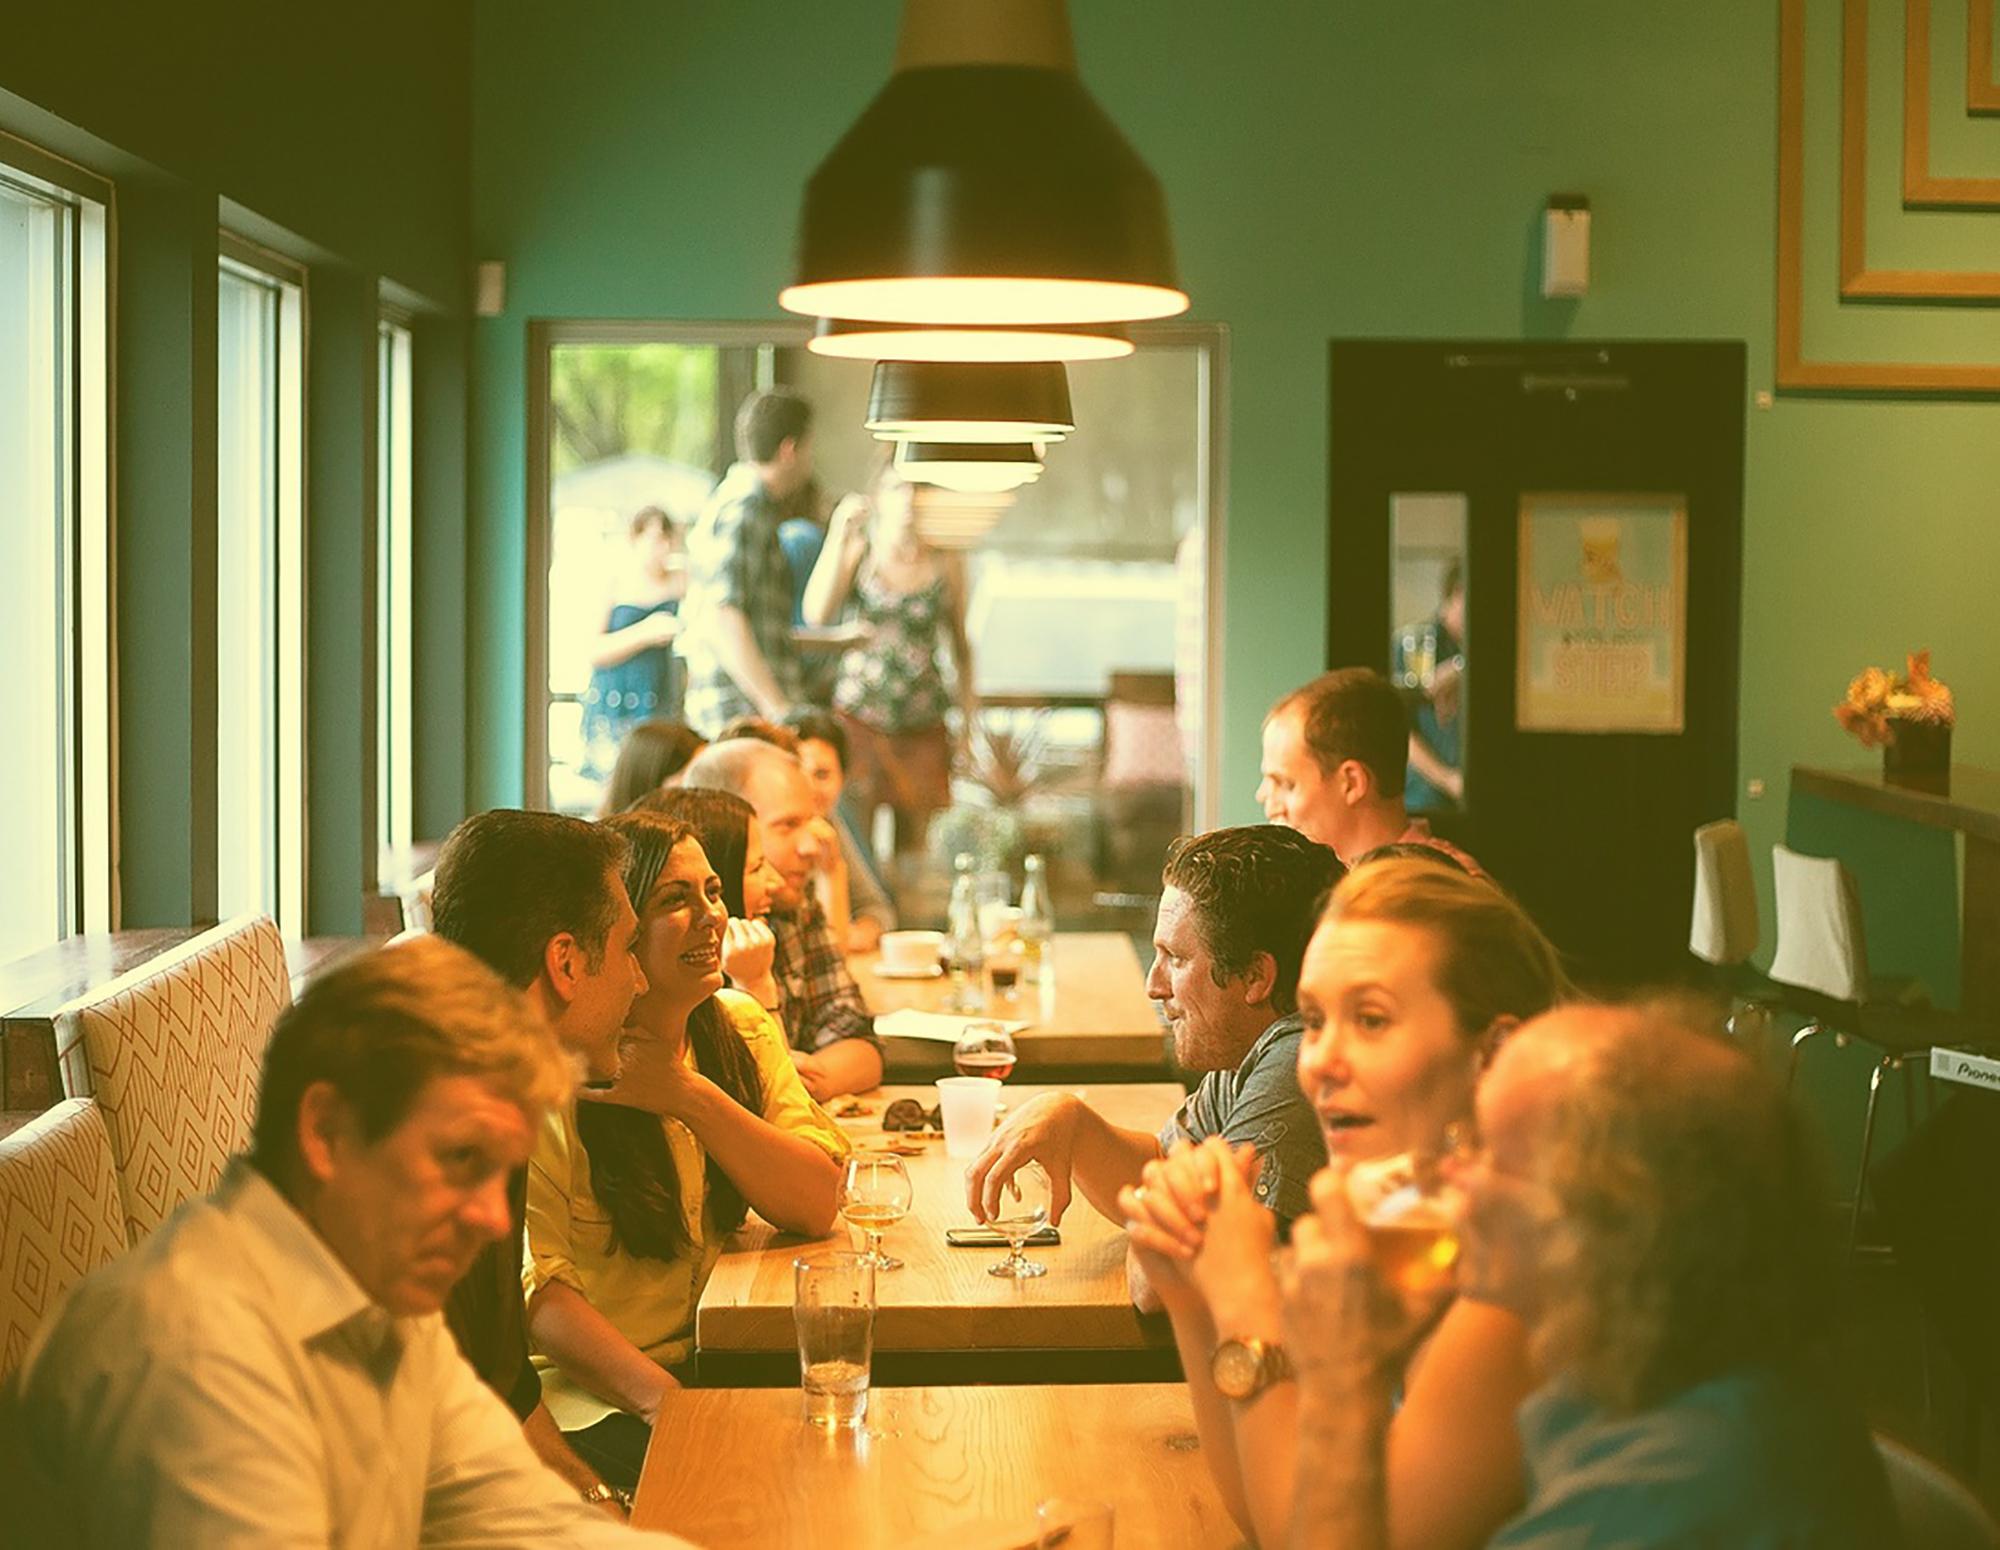 EASE Customer Service Training: Restaurants